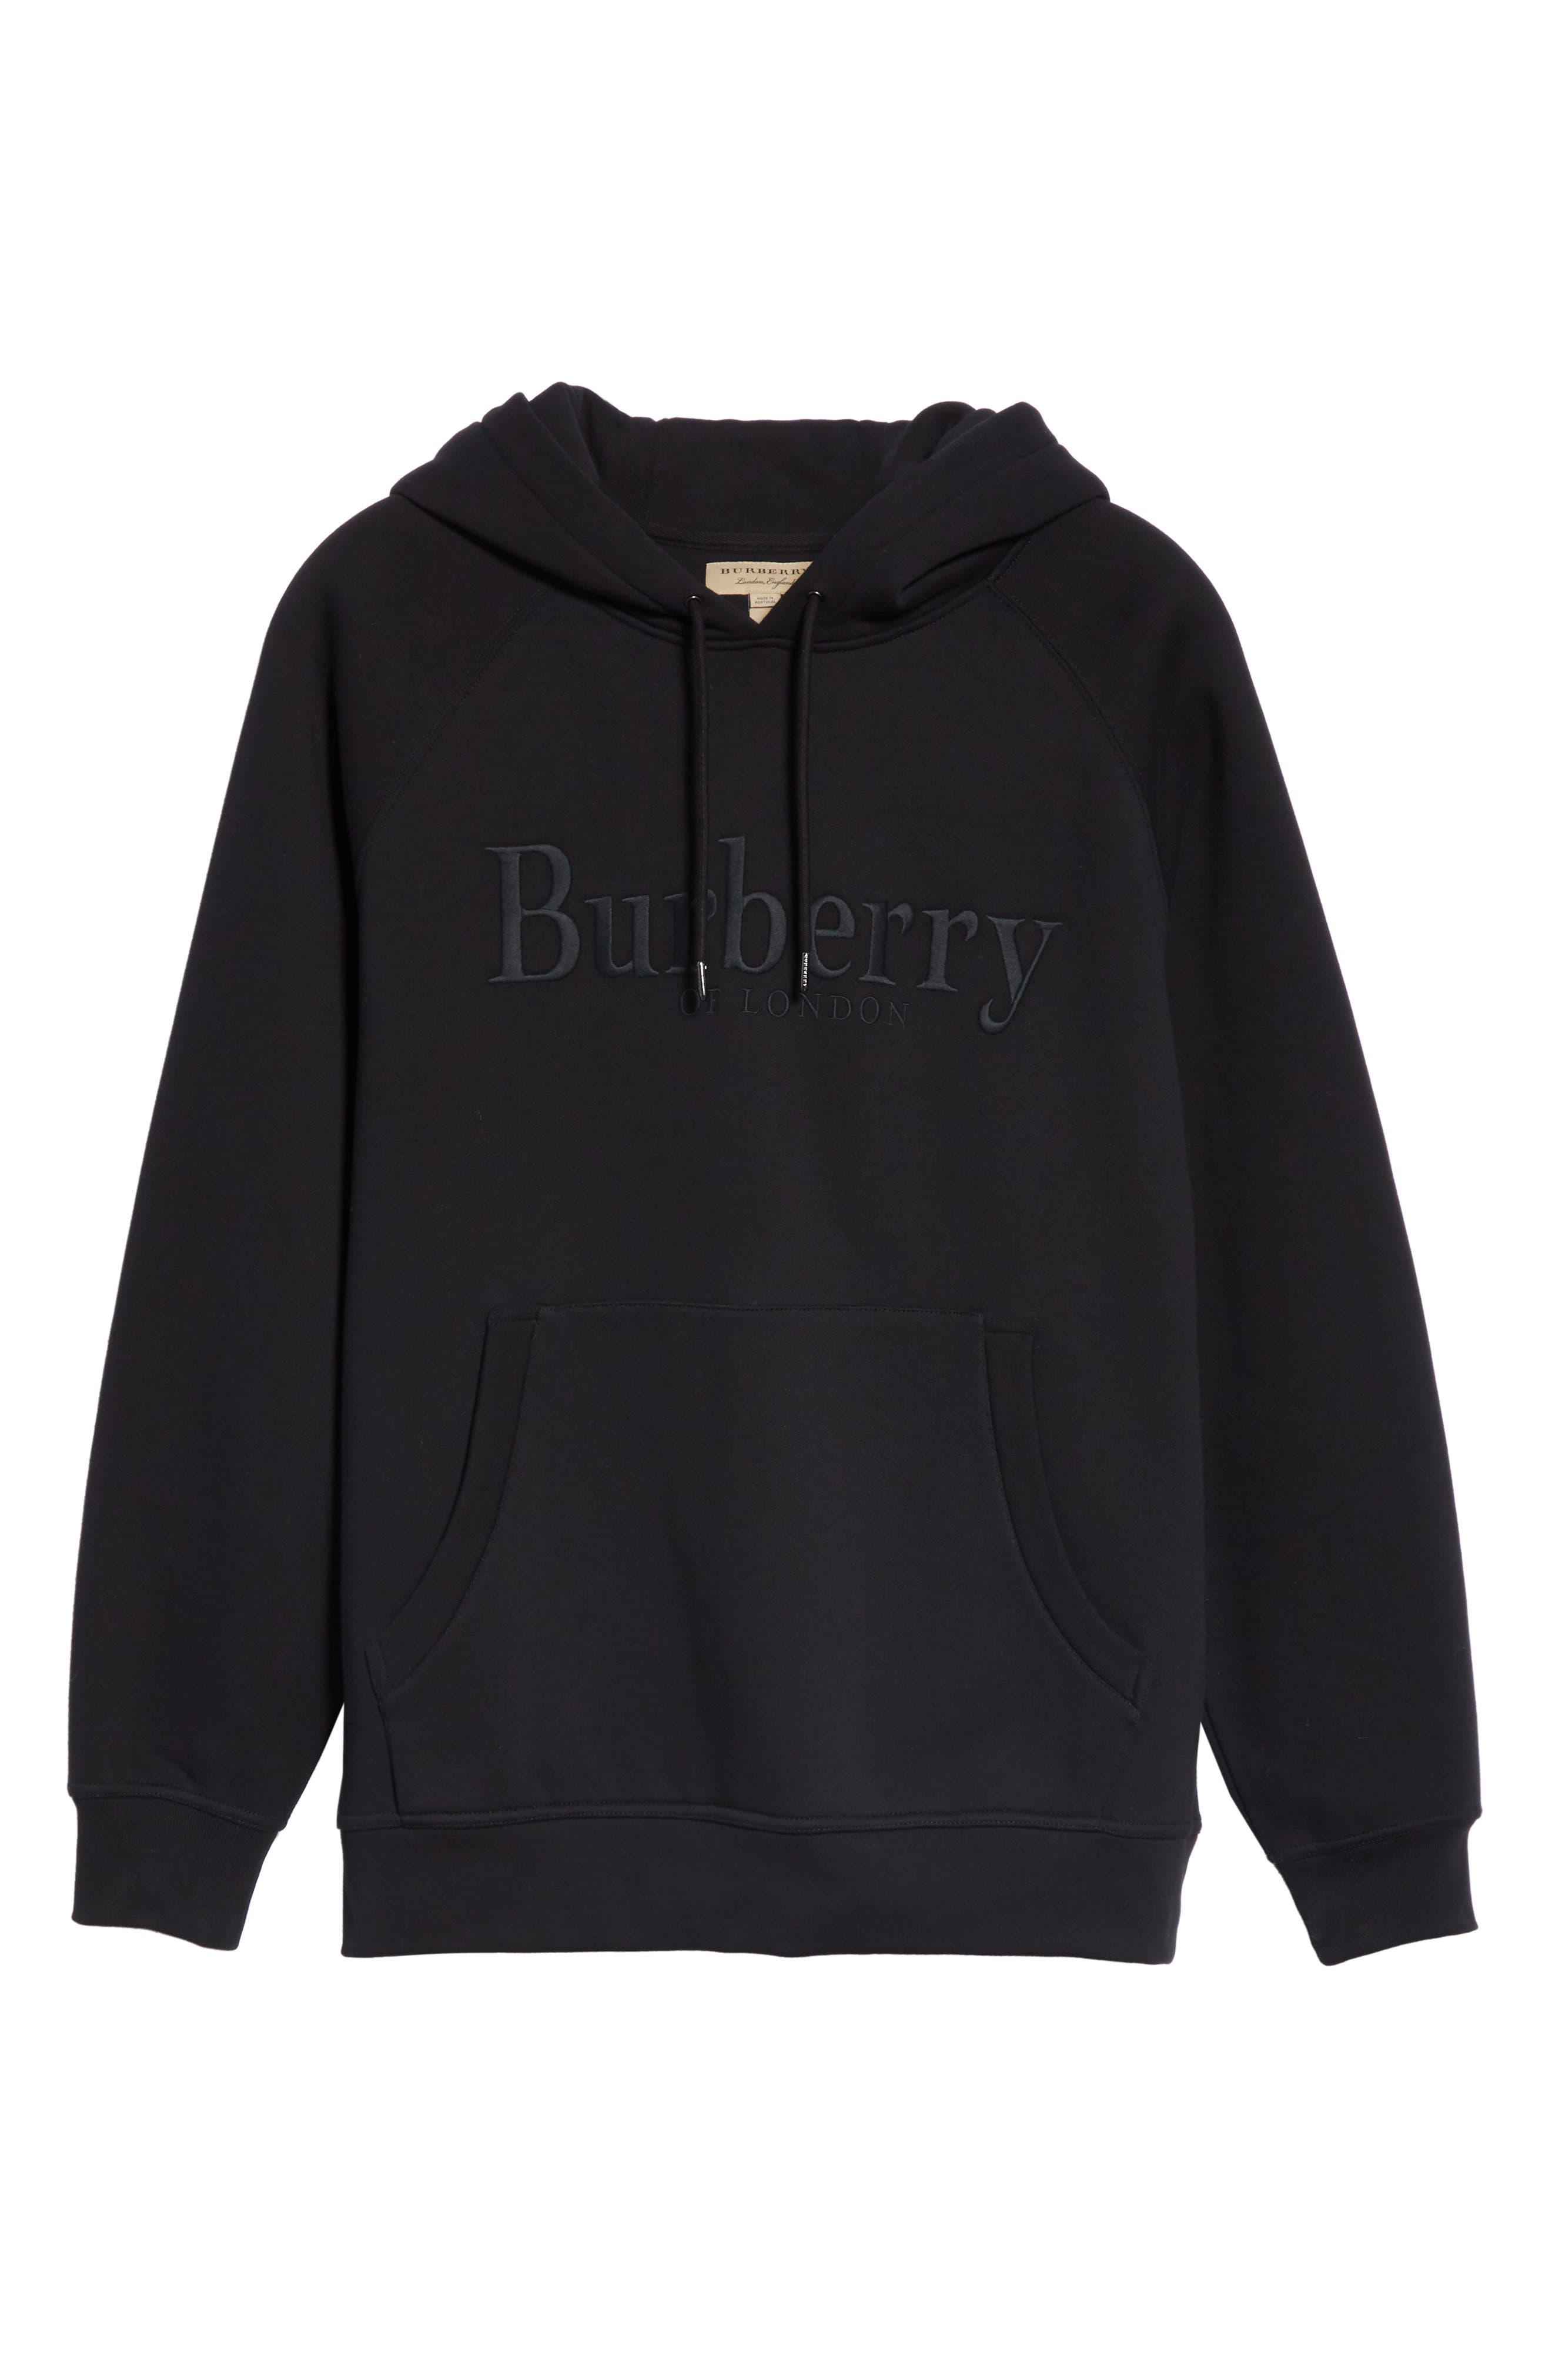 BURBERRY, Clarke Logo Hoodie, Alternate thumbnail 6, color, BLACK